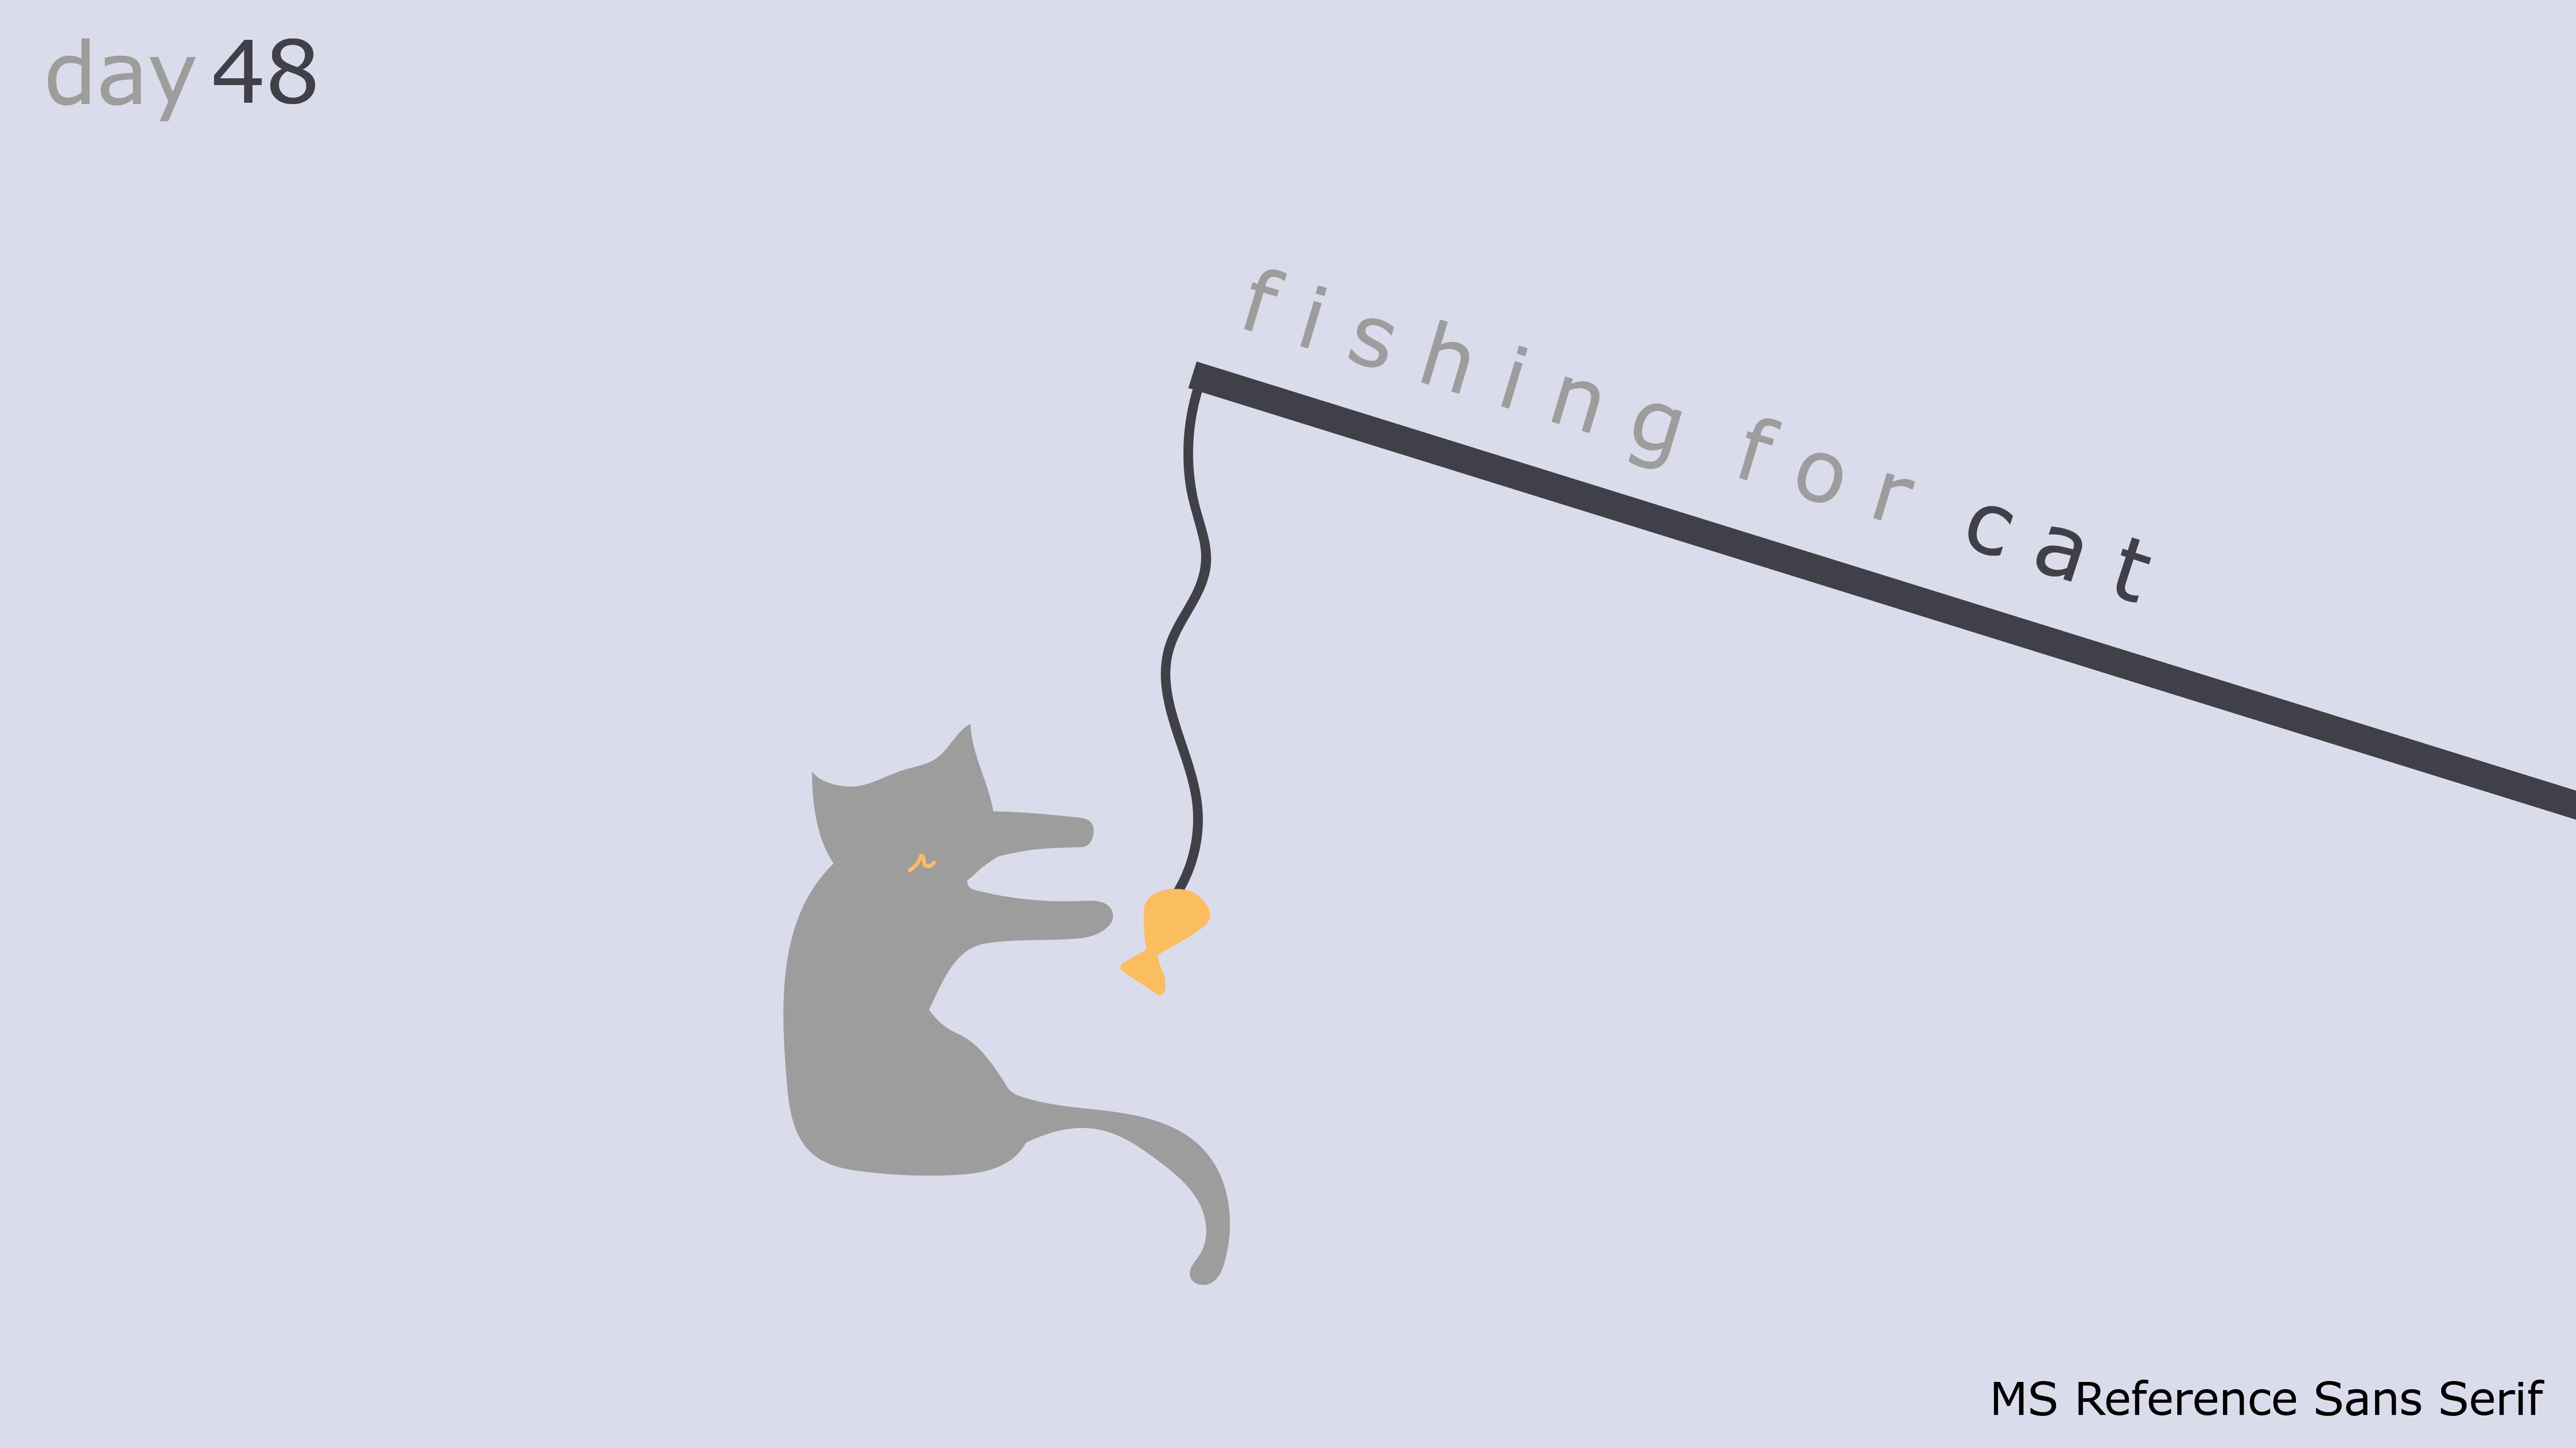 [cat]day4-08